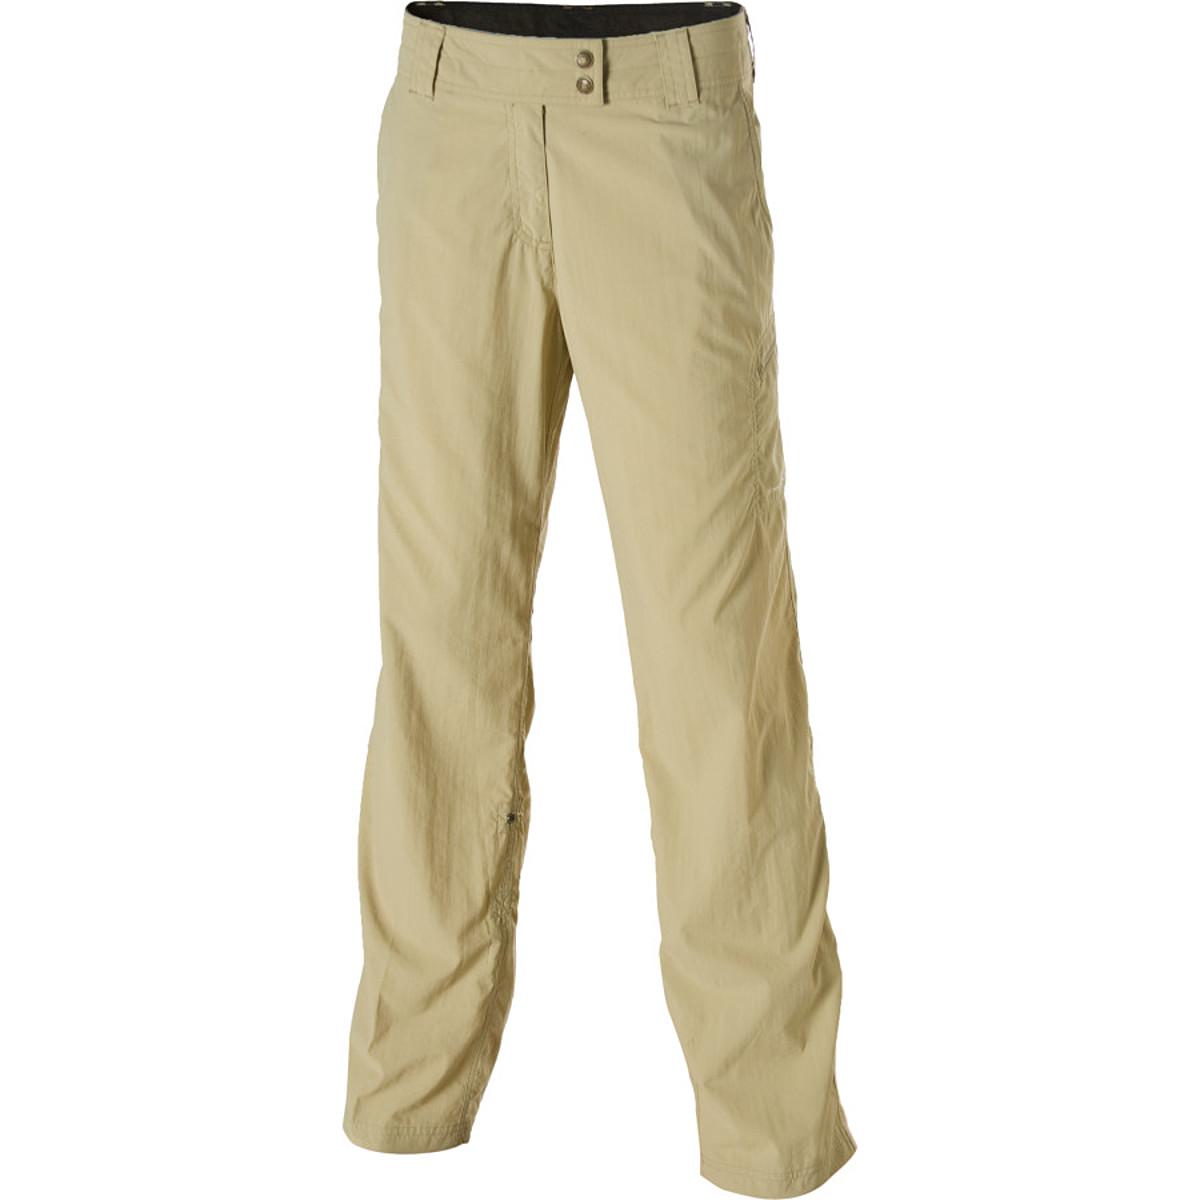 ExOfficio Nomad Roll-up Pant